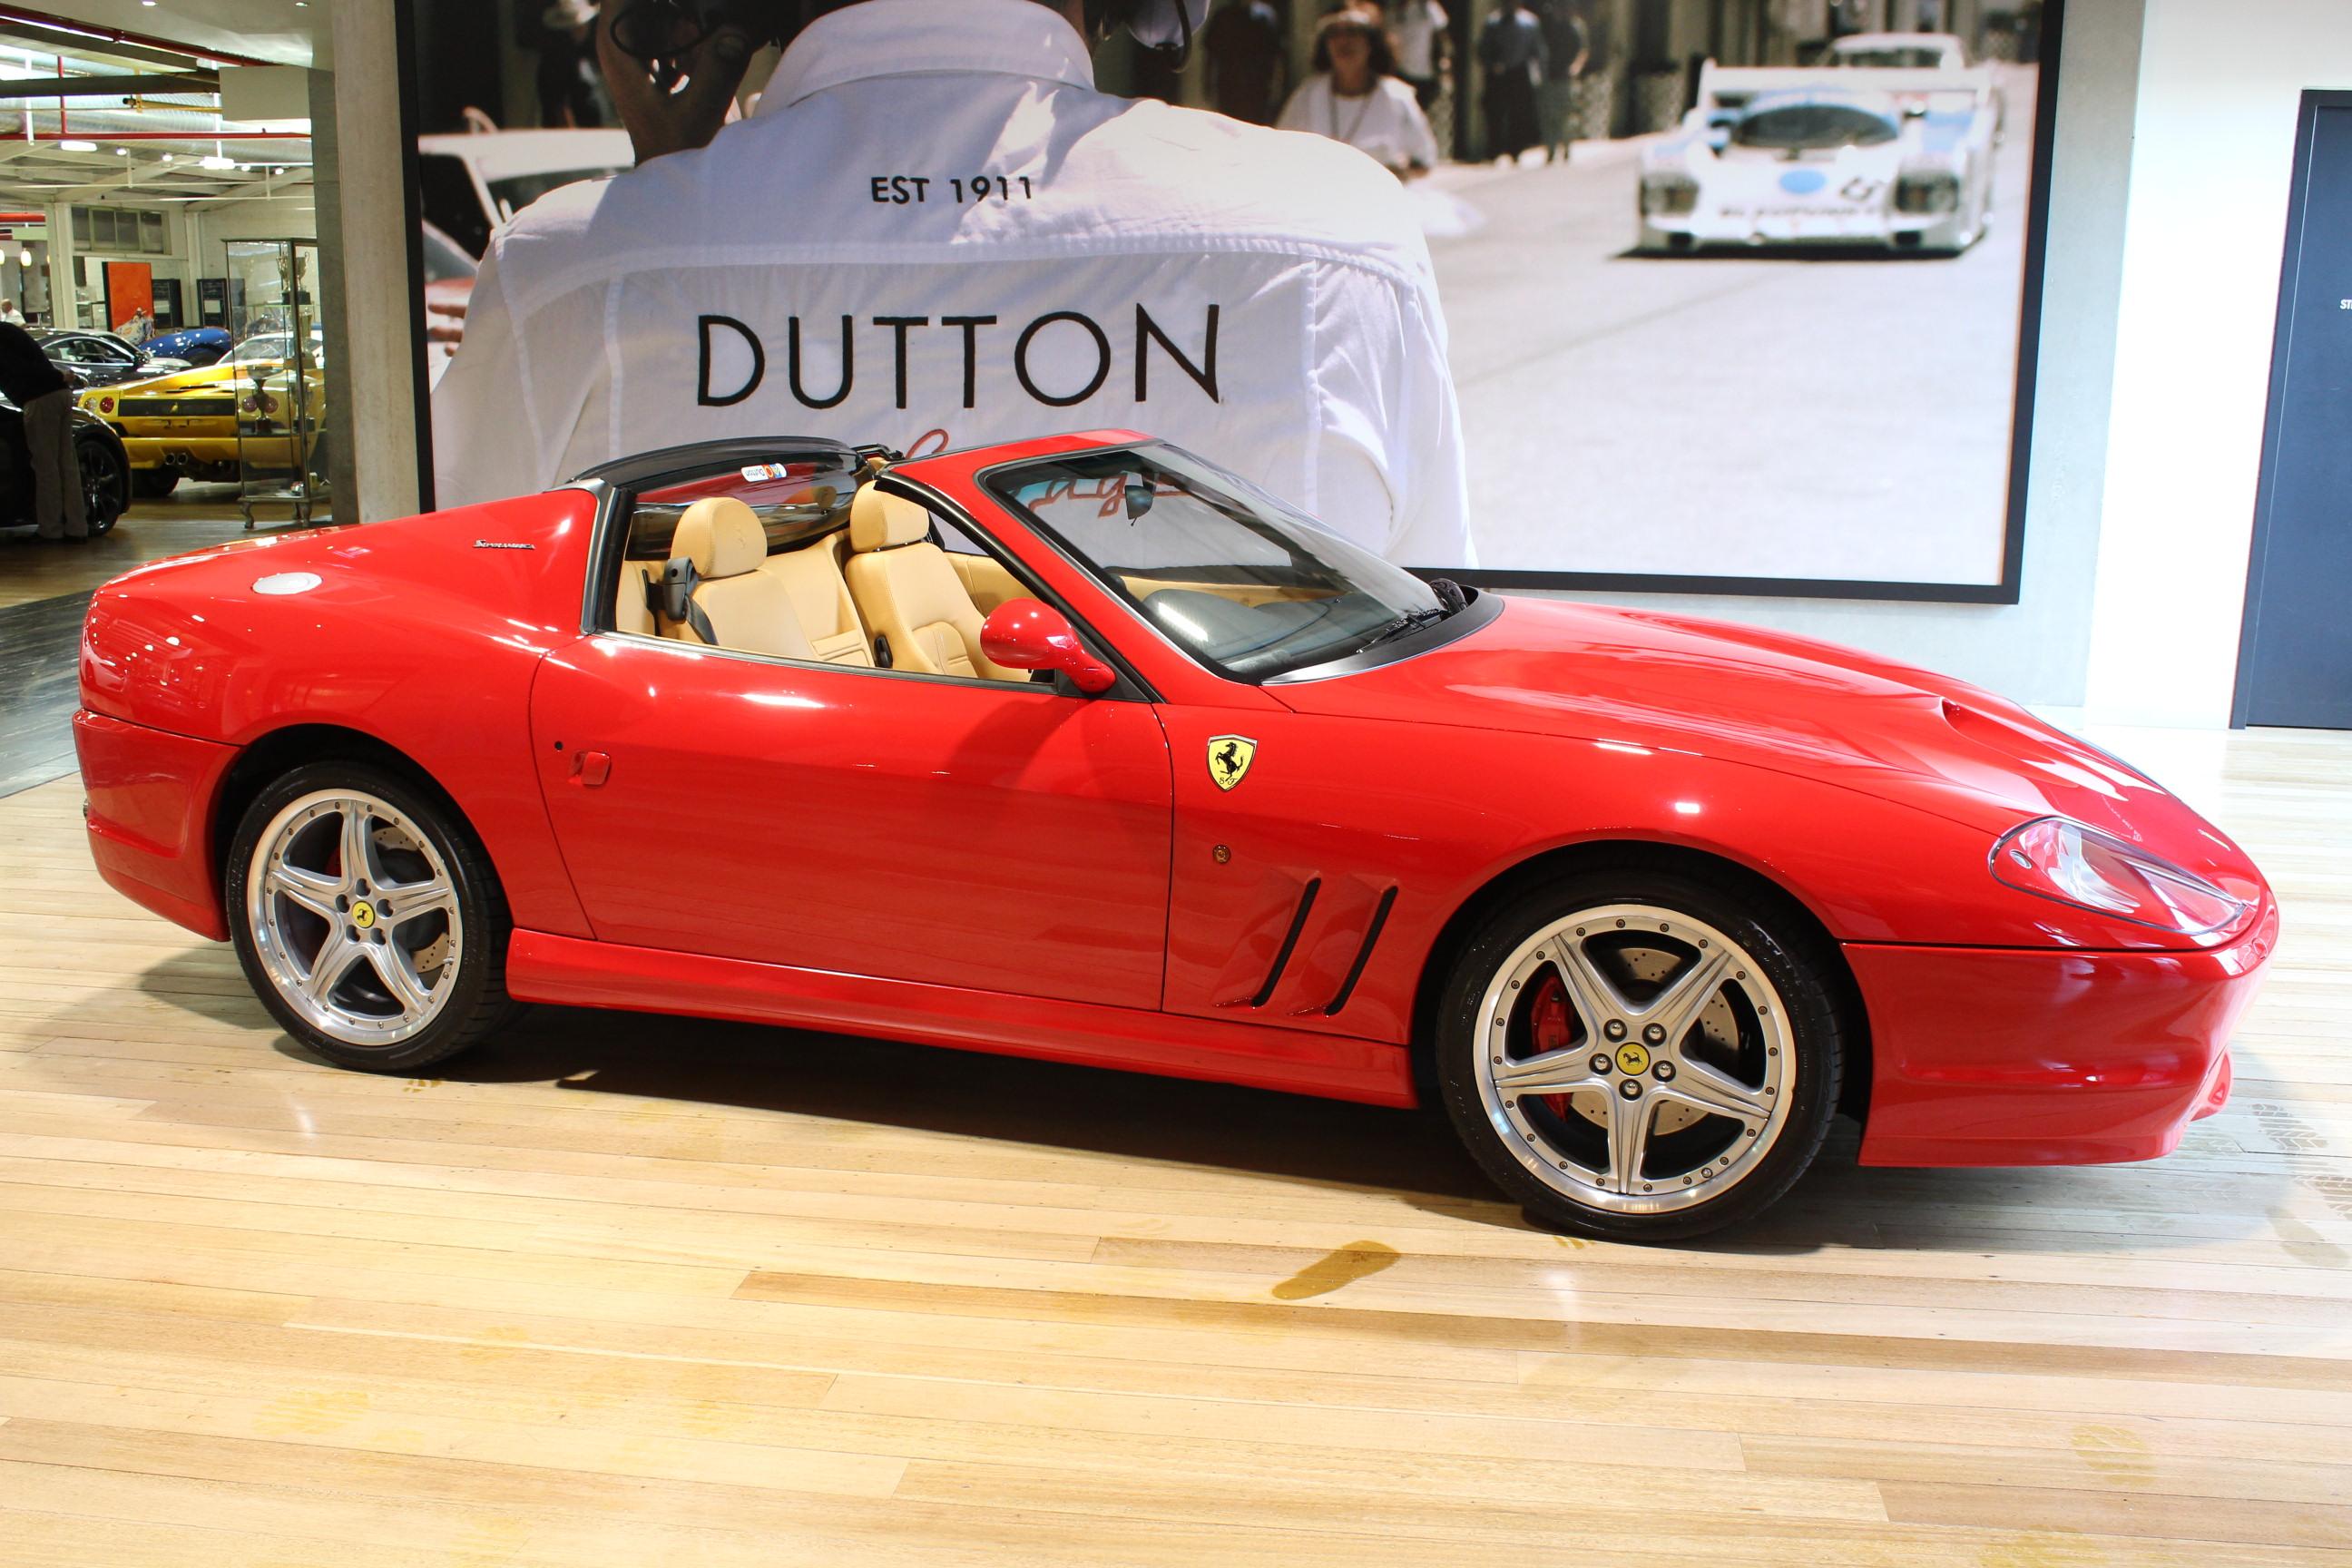 2002 Ferrari SuperAmerica - for sale in Australia